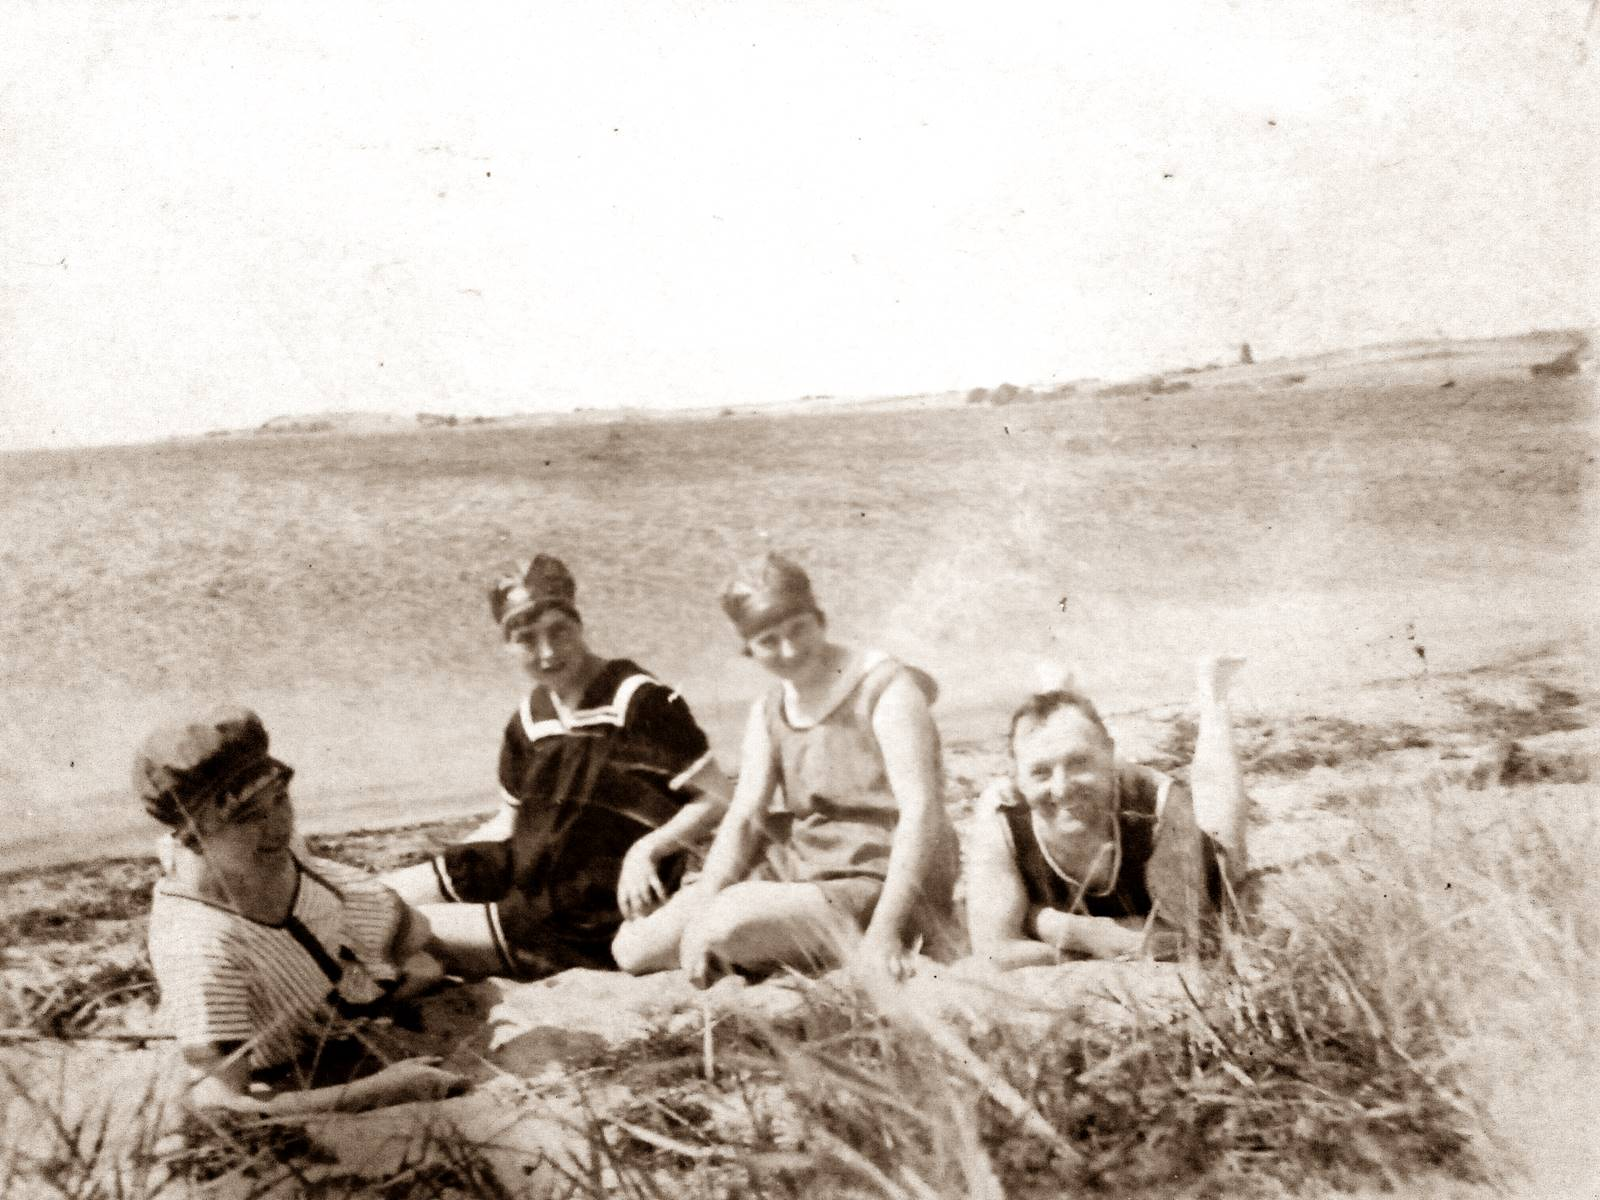 Badegäste im August 1921